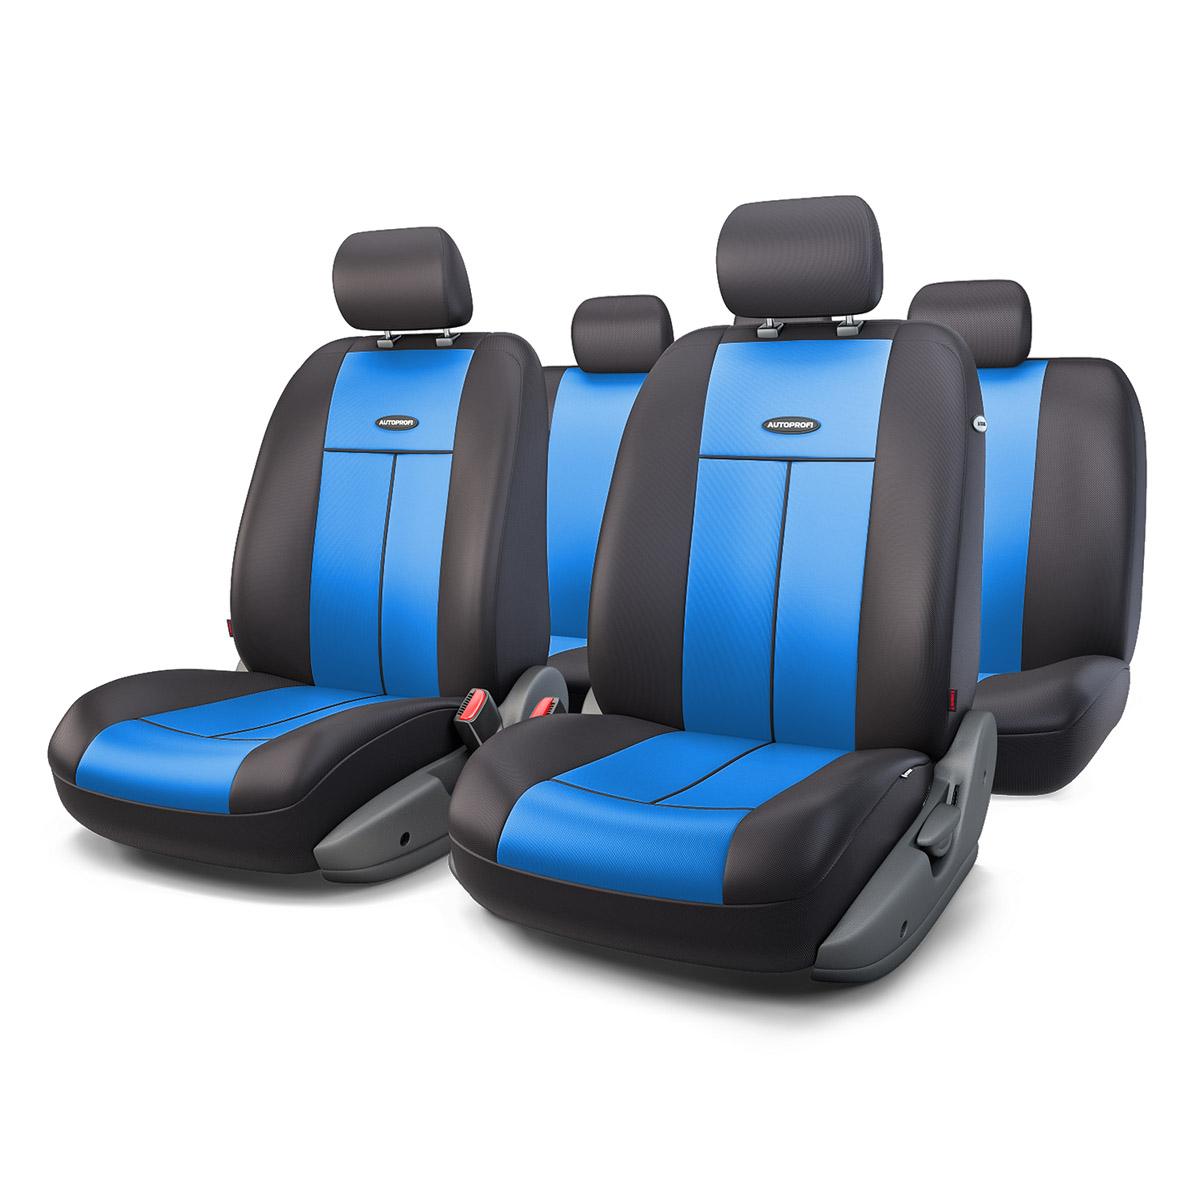 Чехол на сиденье Autoprofi Tt-902p bk/bl чехол на сиденье autoprofi eco 1105 bk bl м